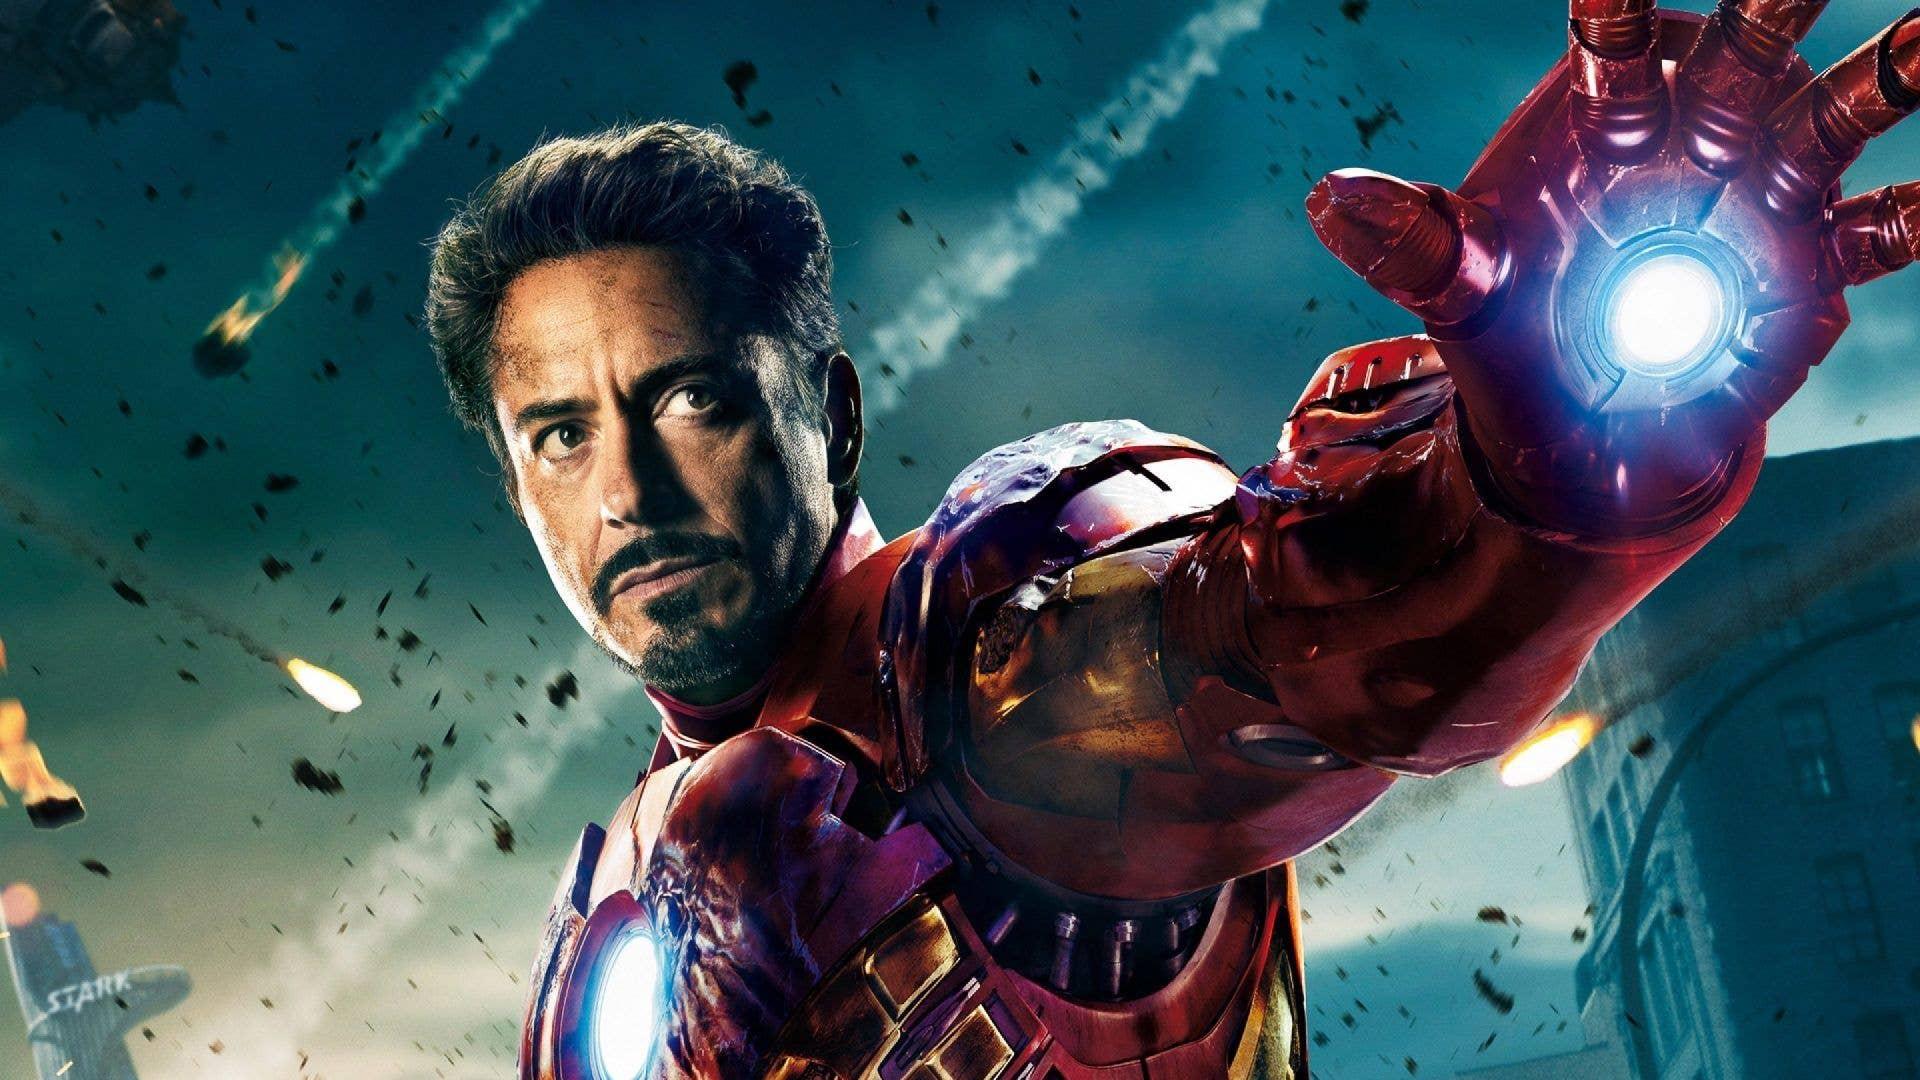 iron man movie download